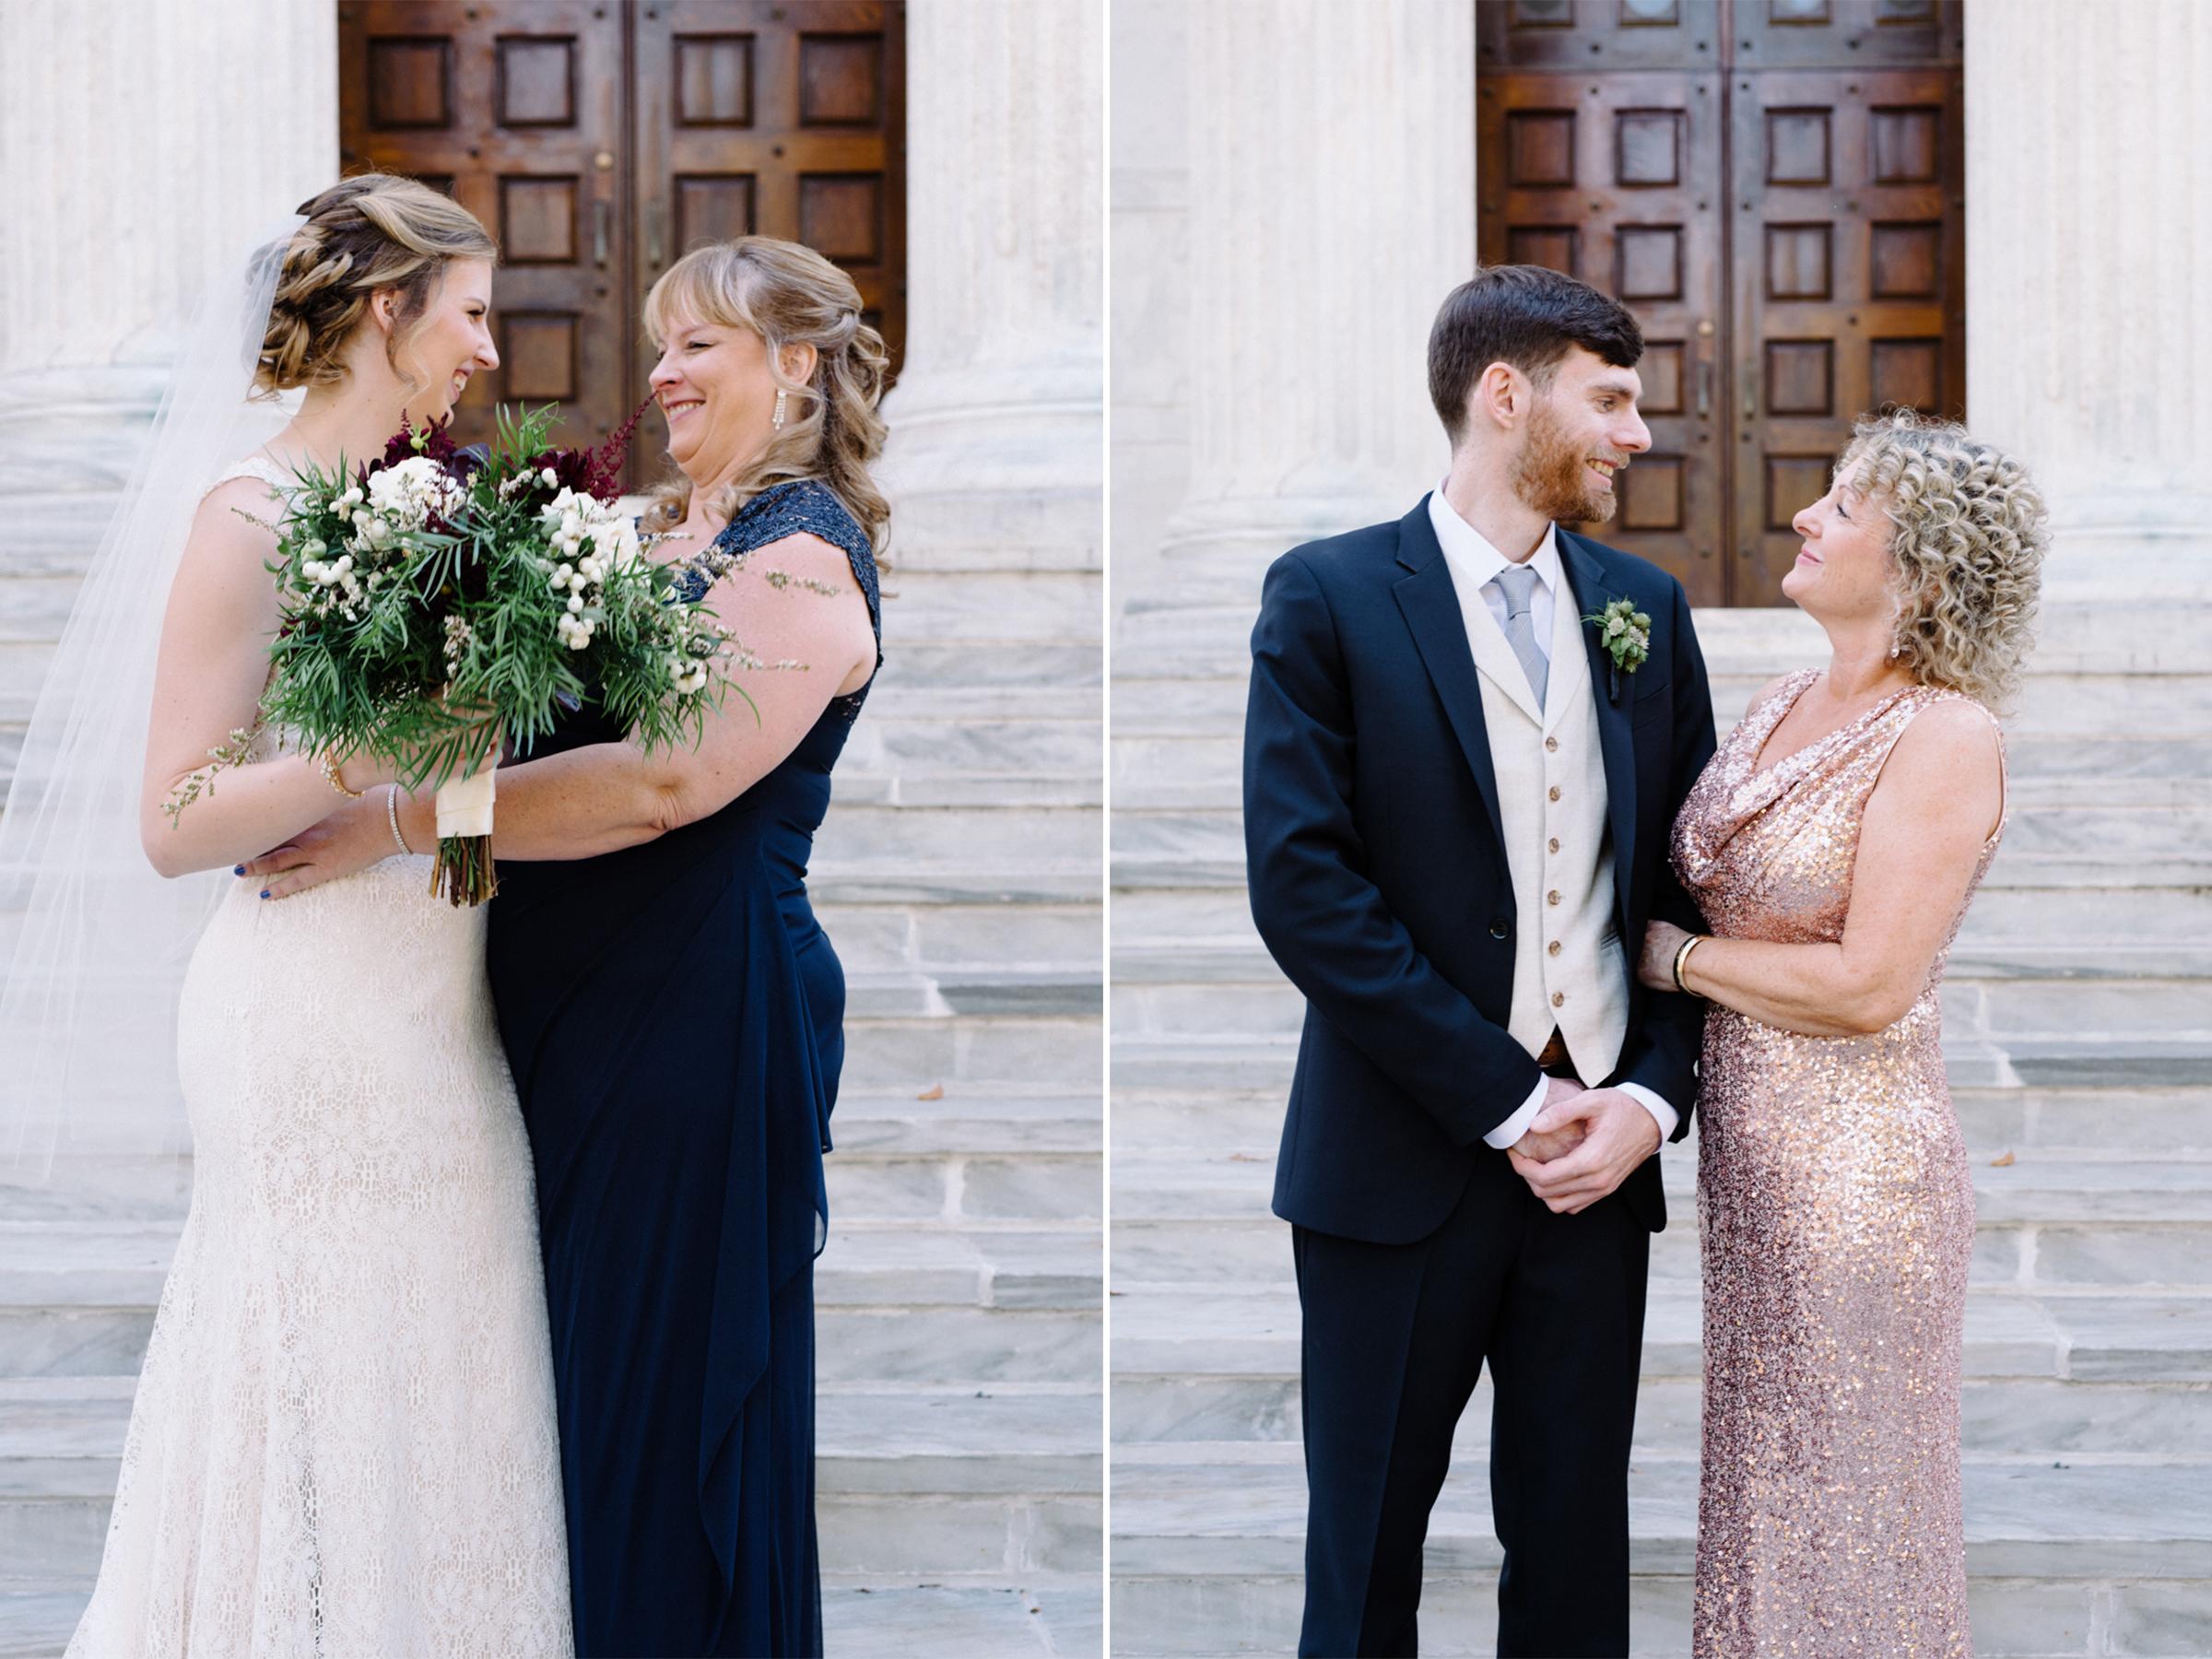 Chelsea+James- Bride and Groom with Moms- Princeton University Campus Wedding- Olivia Christina Photo.jpg